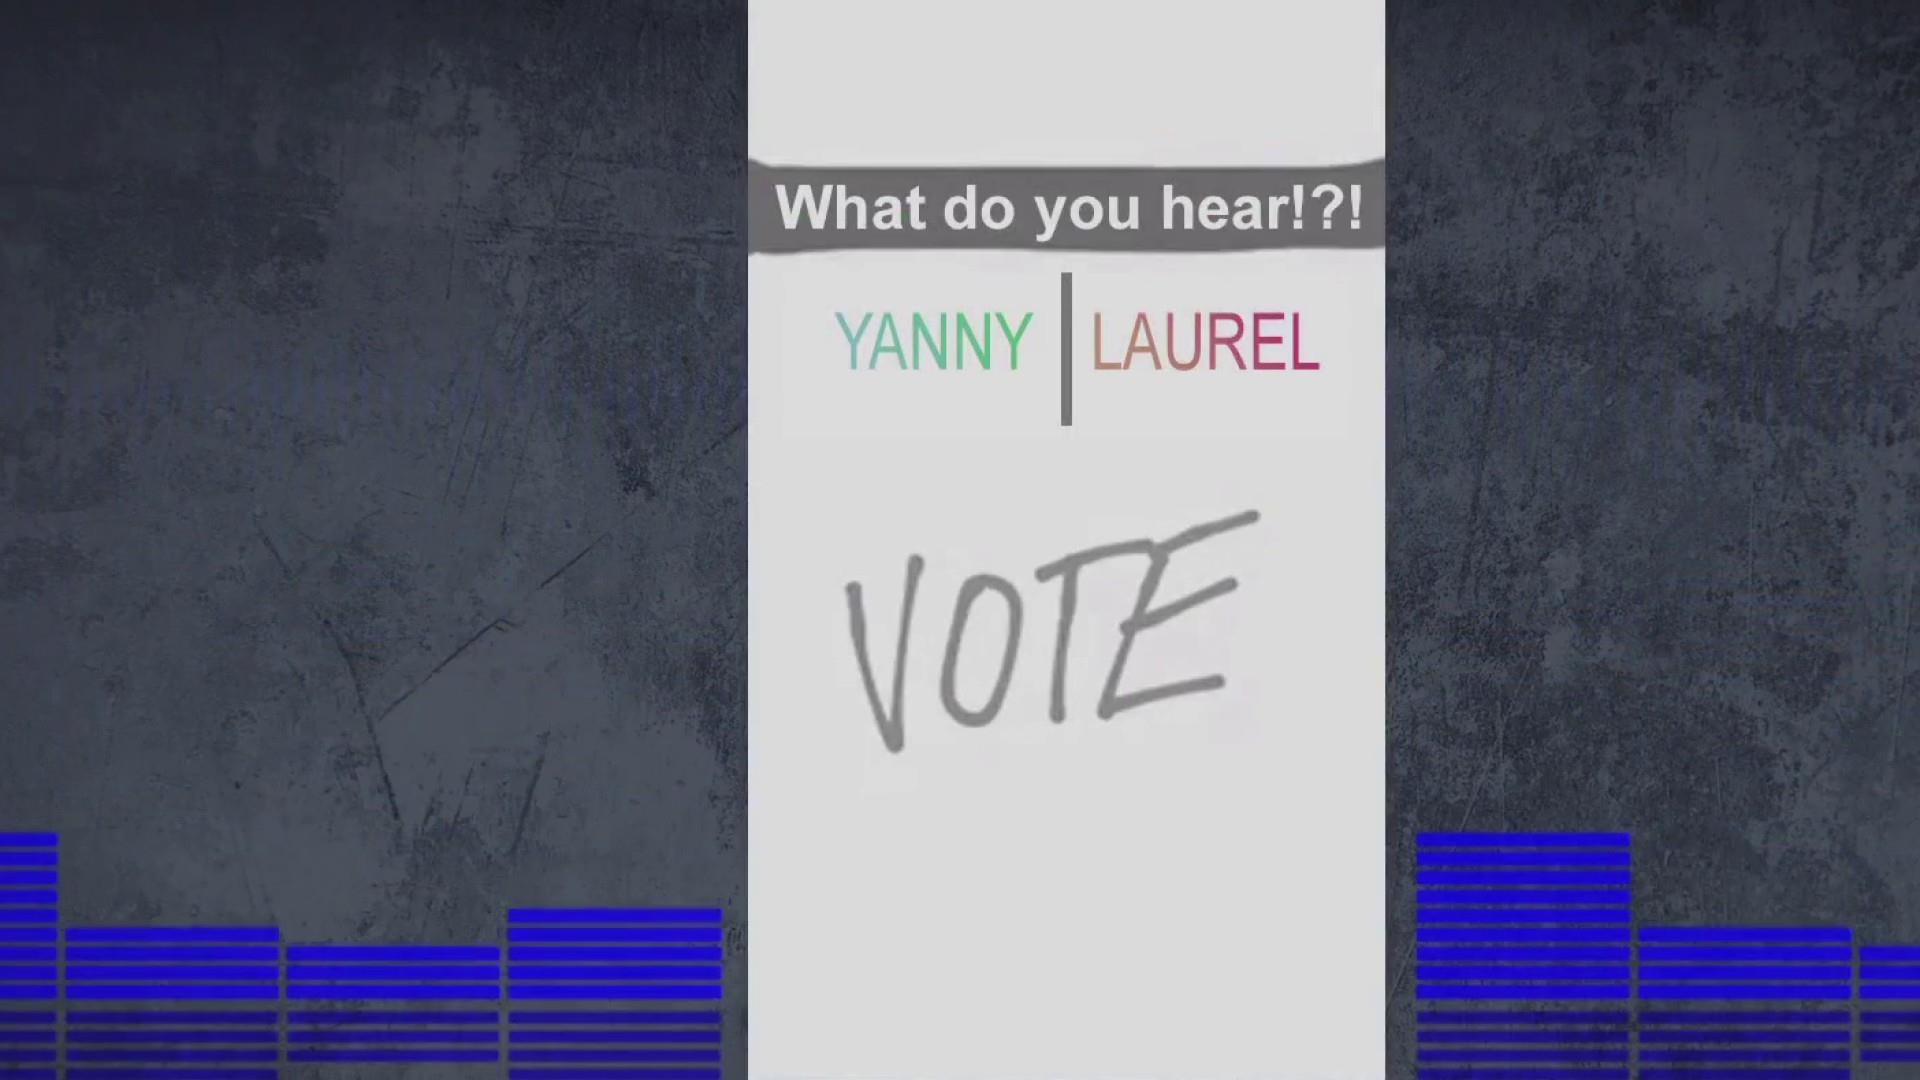 Laurel or Yanni